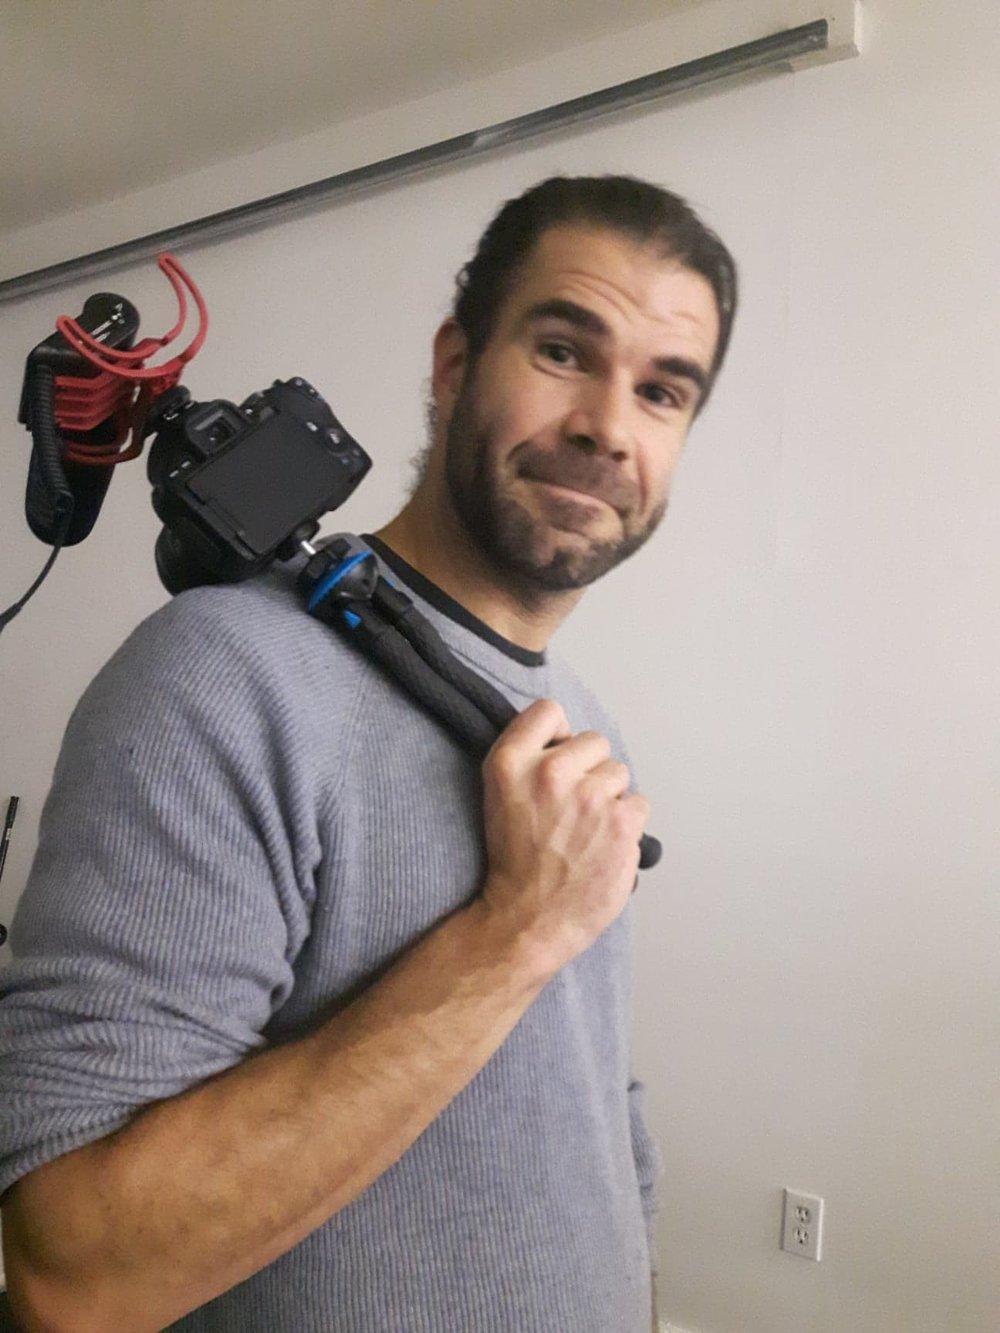 Josh, camera operator extraordinaire.